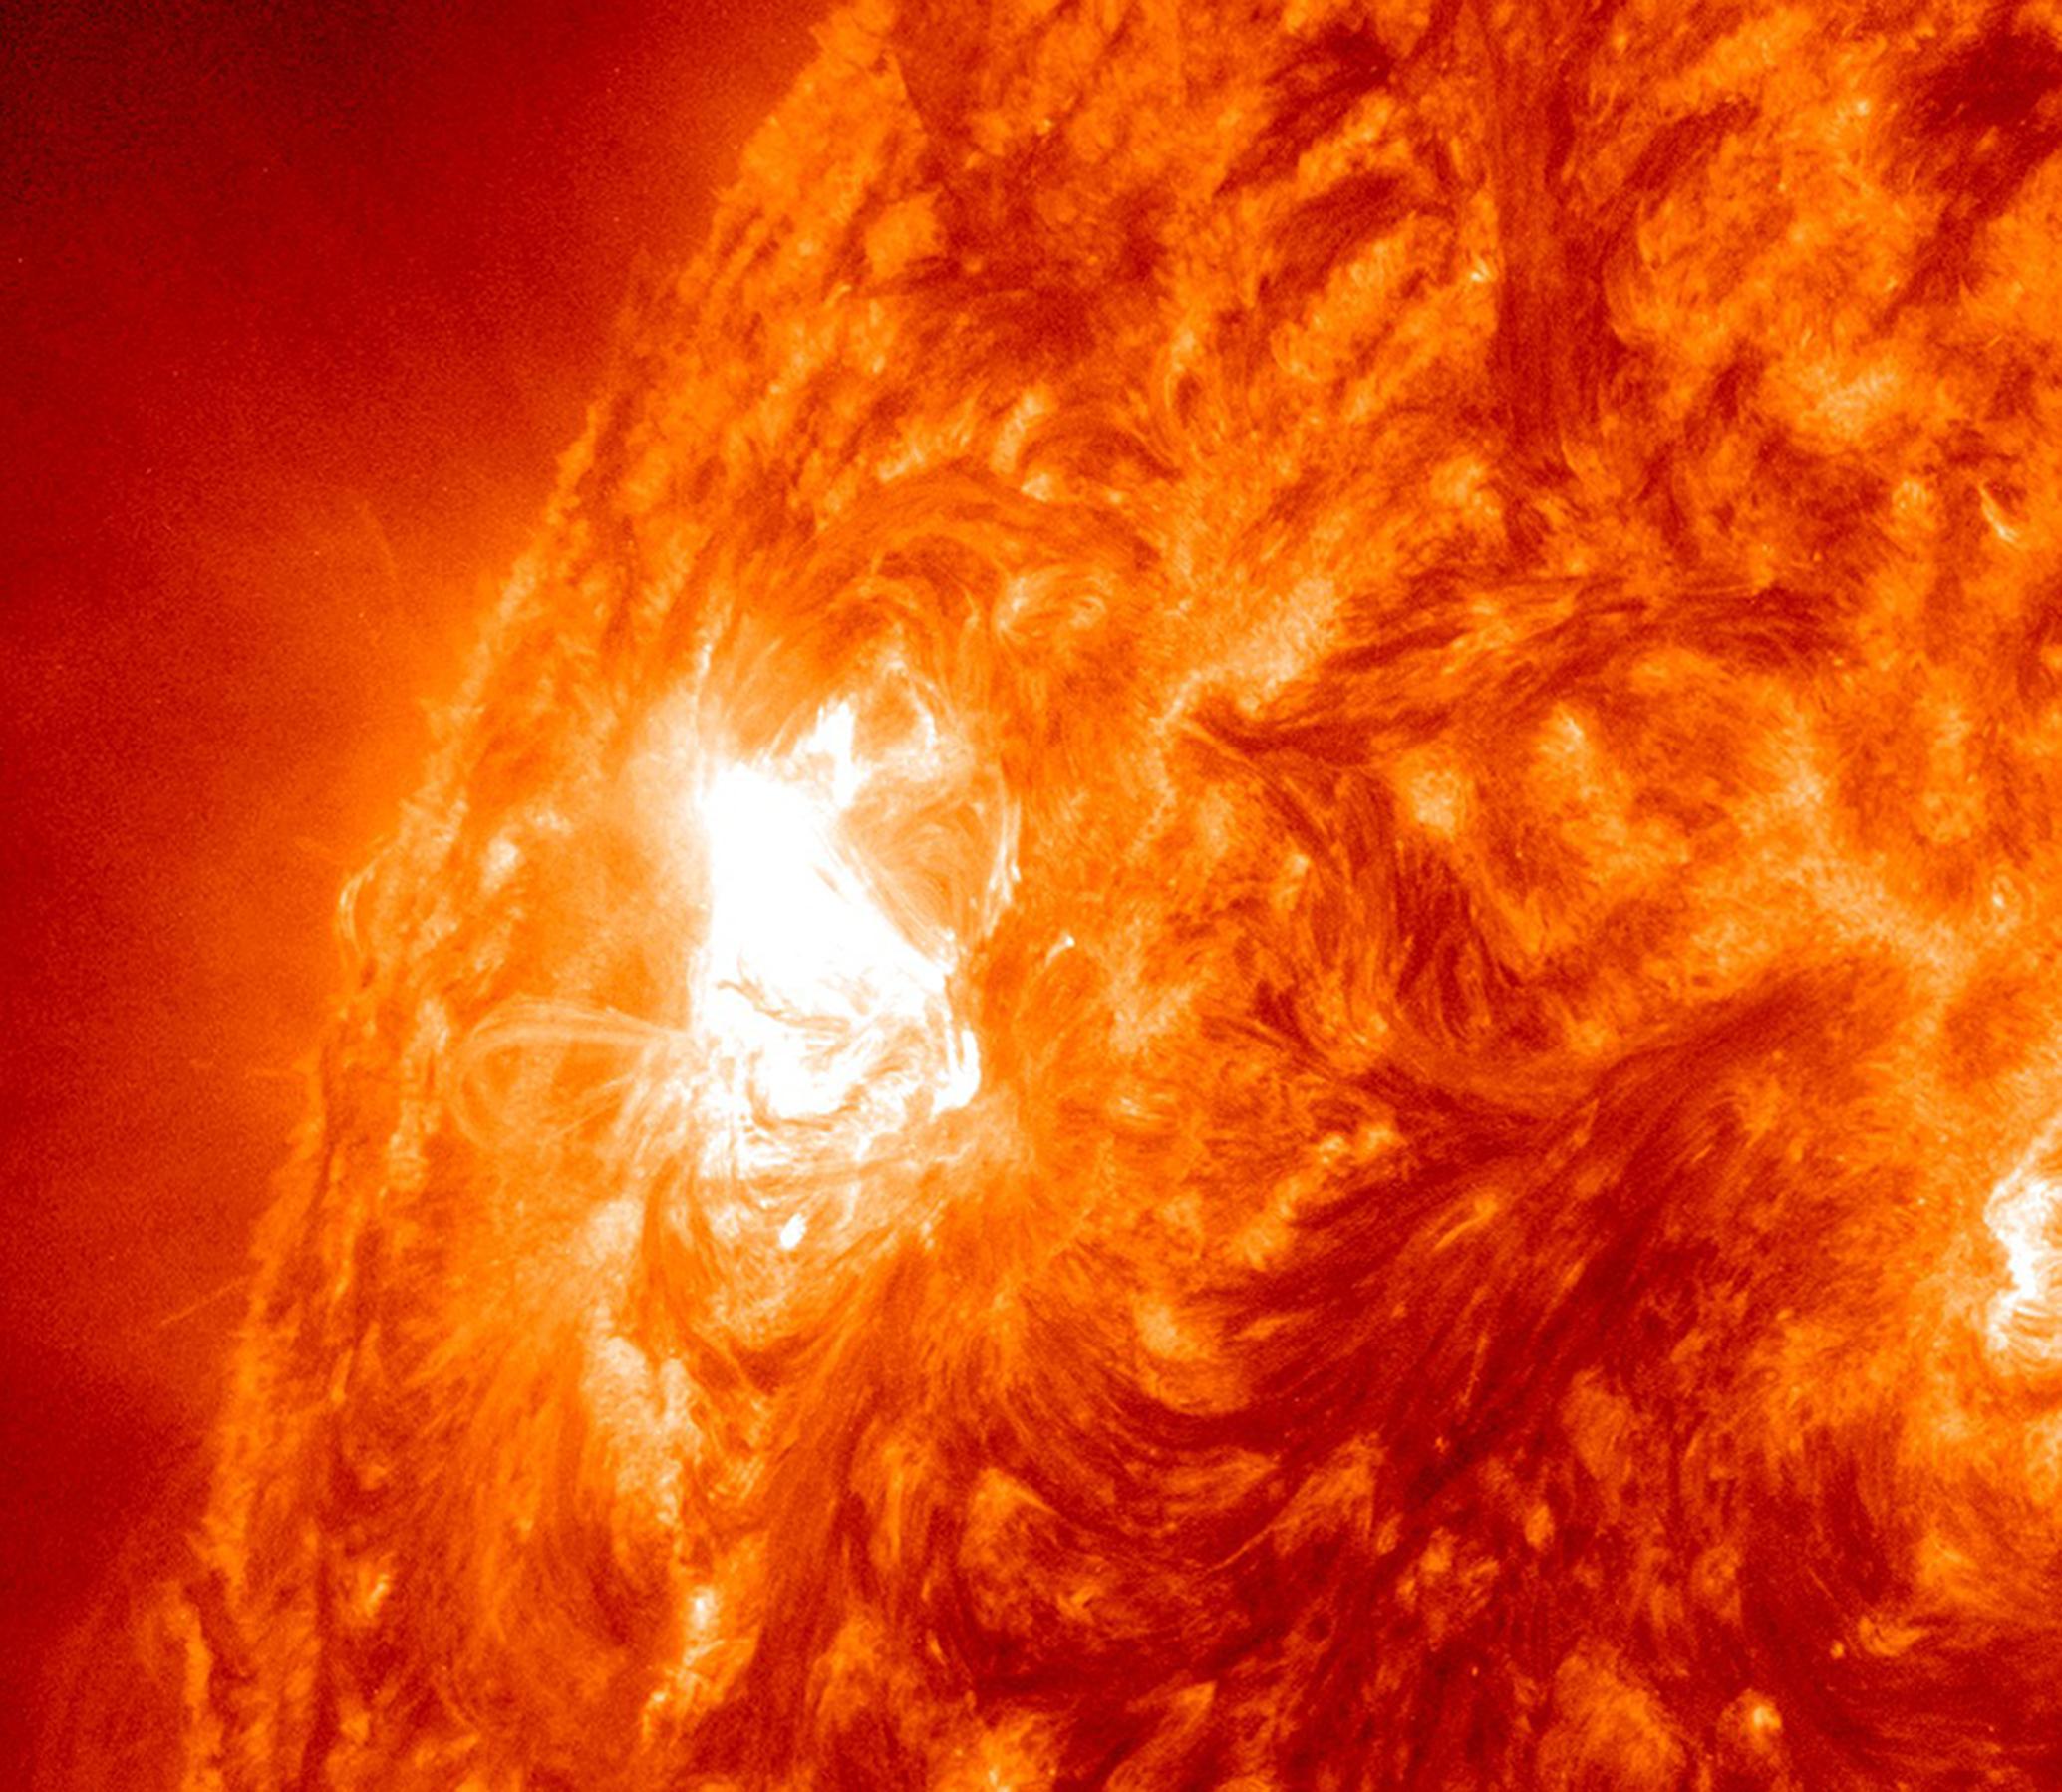 solar storm activity - photo #19